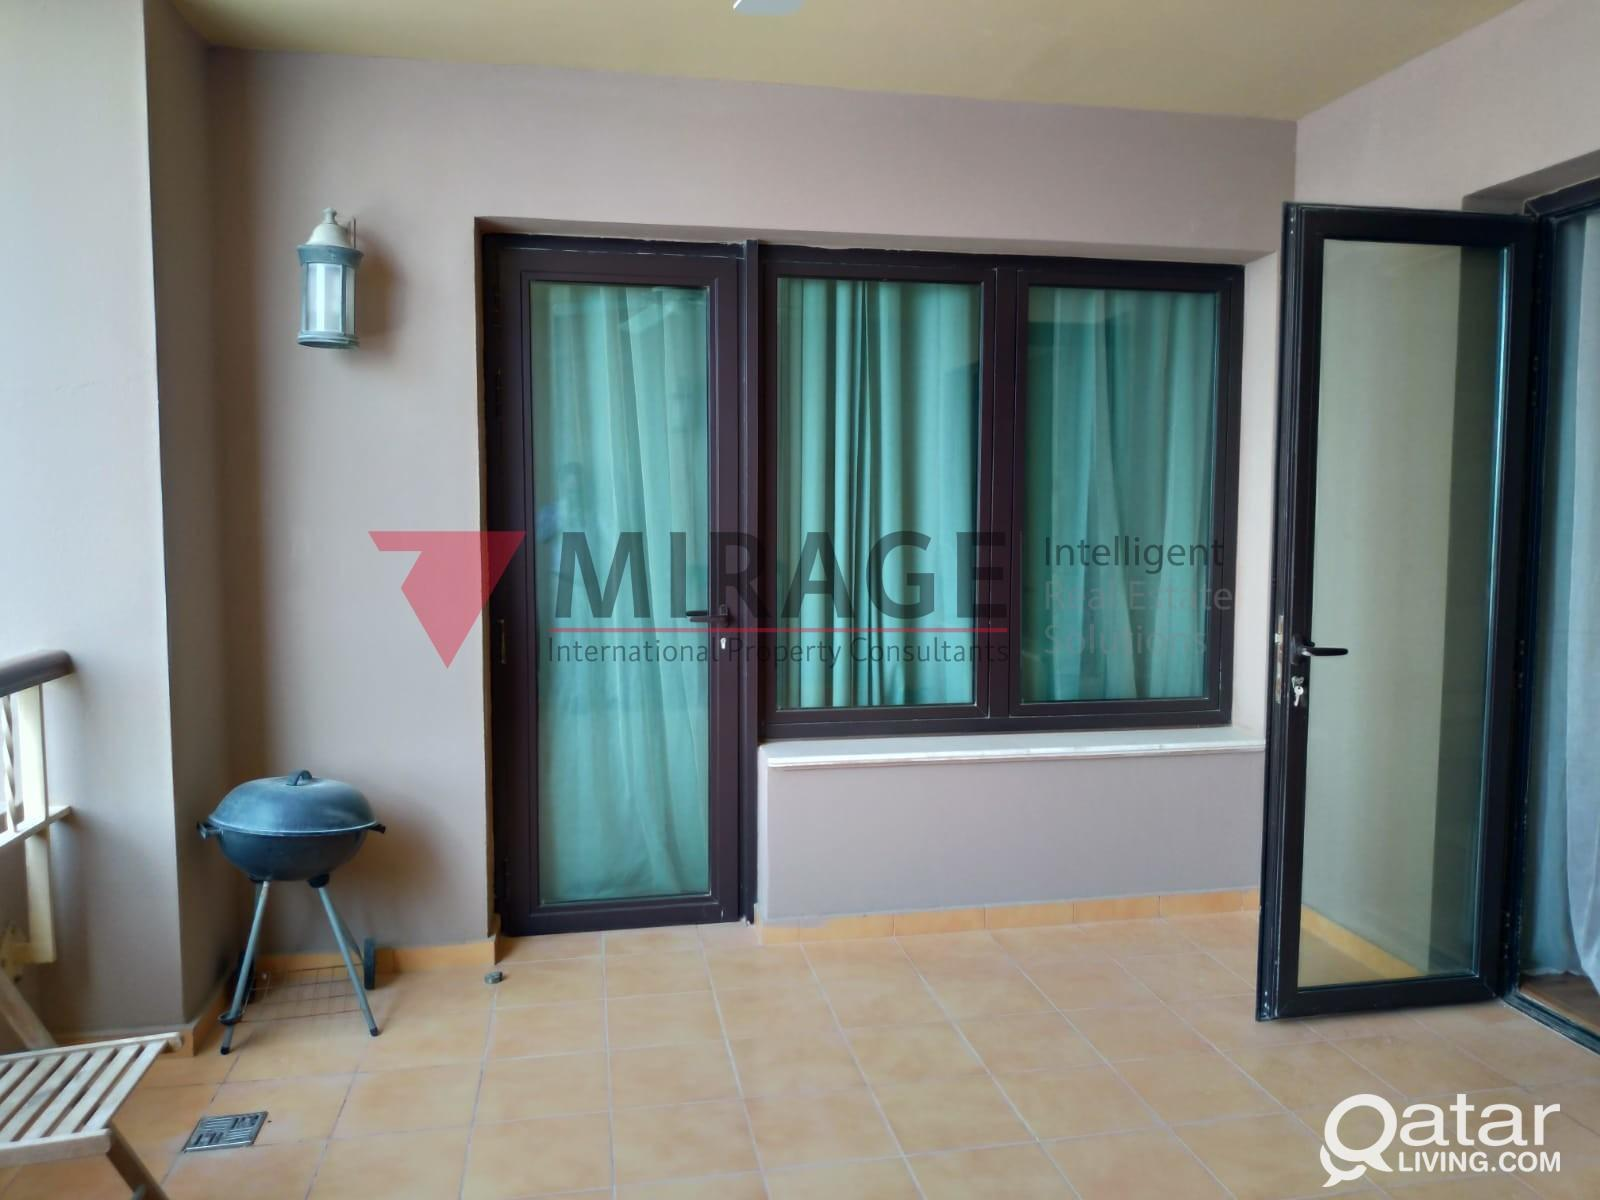 Elegant Furnished| 1 Bedroom| Parquet Floor